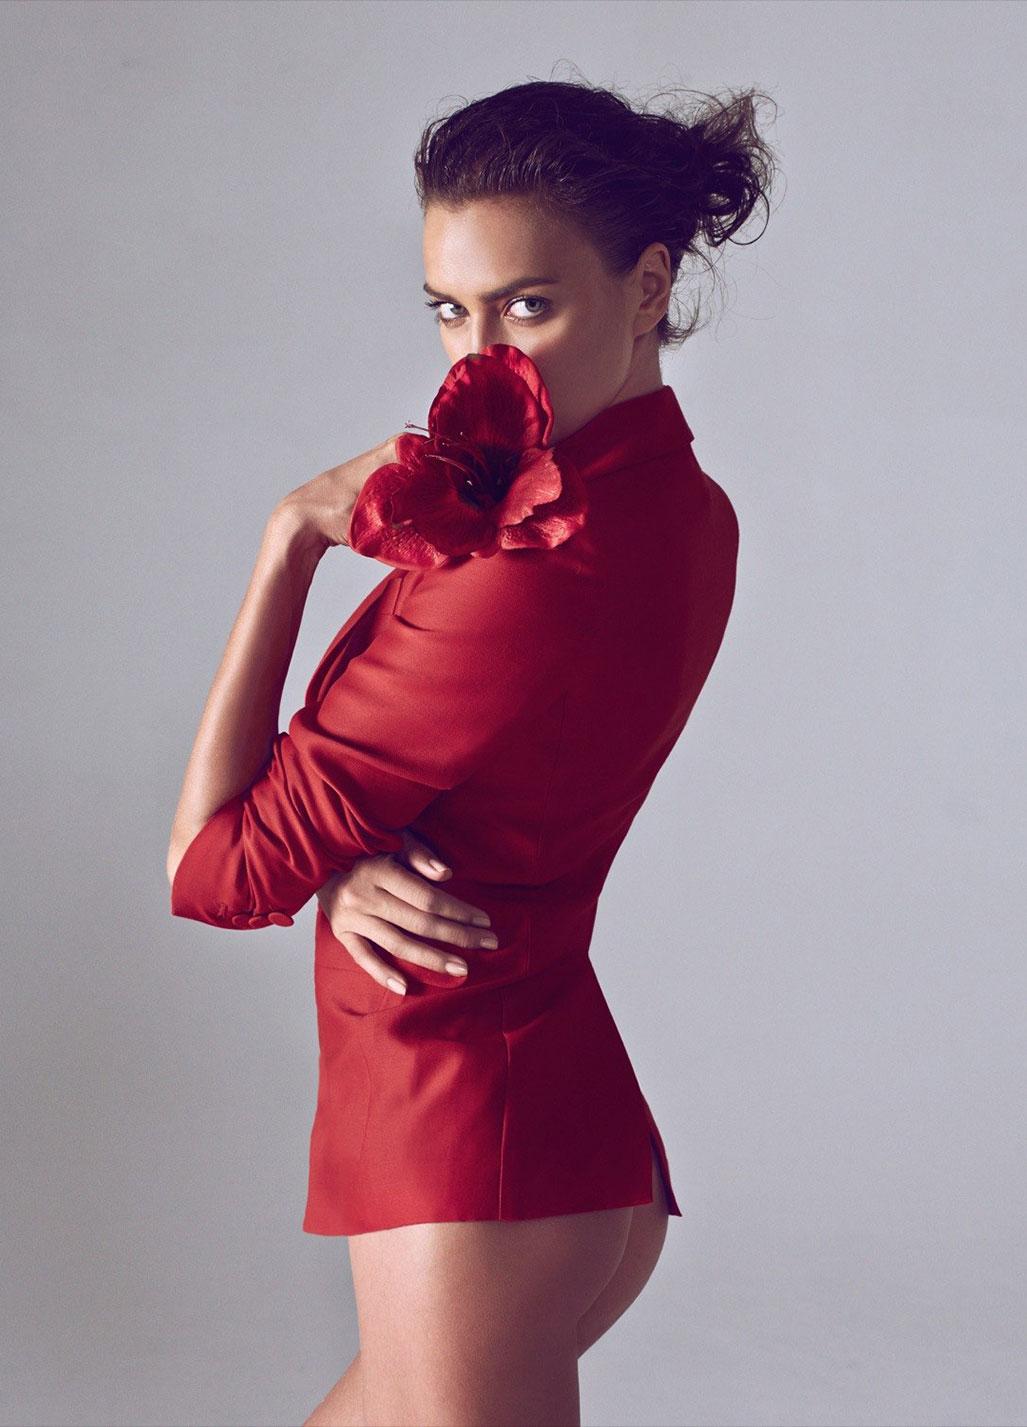 Irina Shayk by Koray Birand / Harpers Bazaar China march 2015